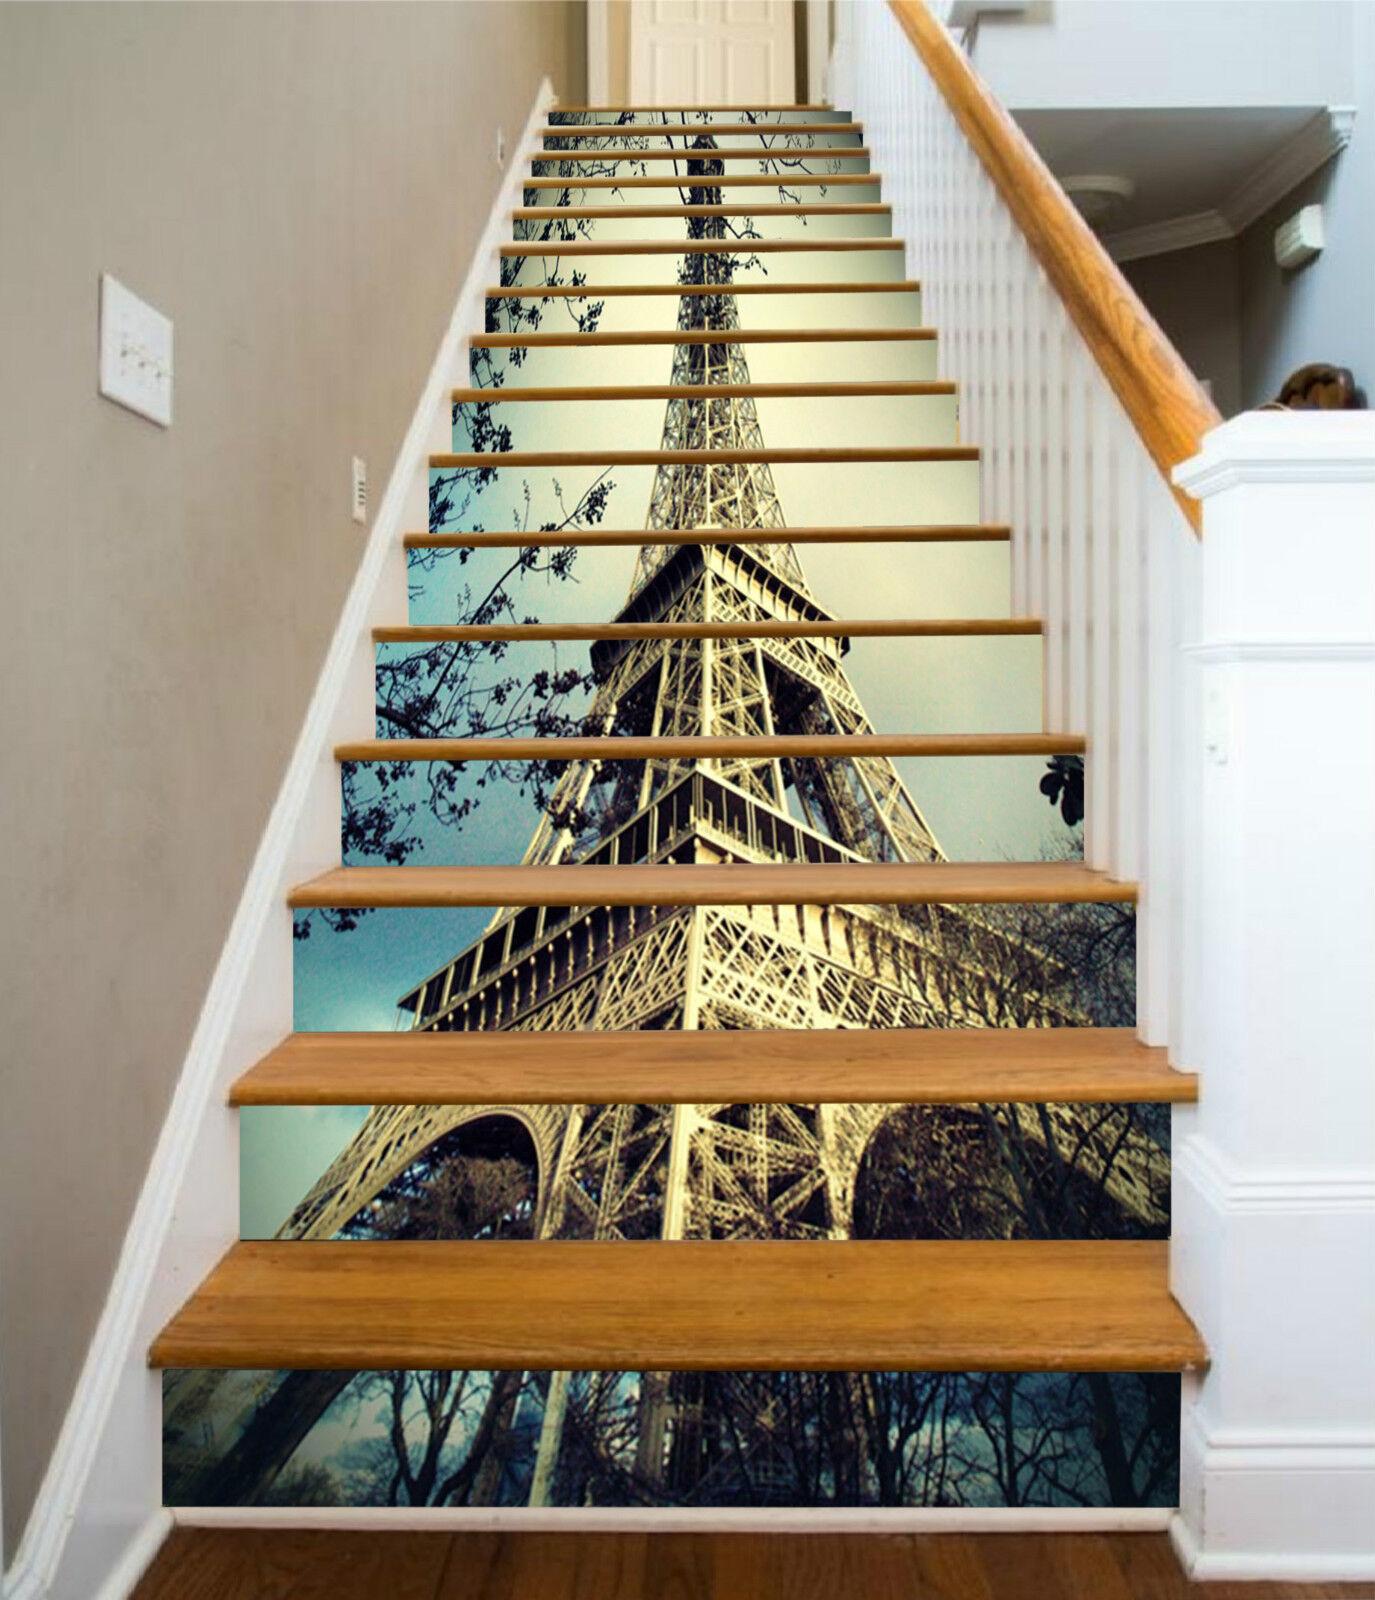 3D Eiffelturm 082 Stair Risers Dekoration Fototapete Vinyl Aufkleber Tapete DE